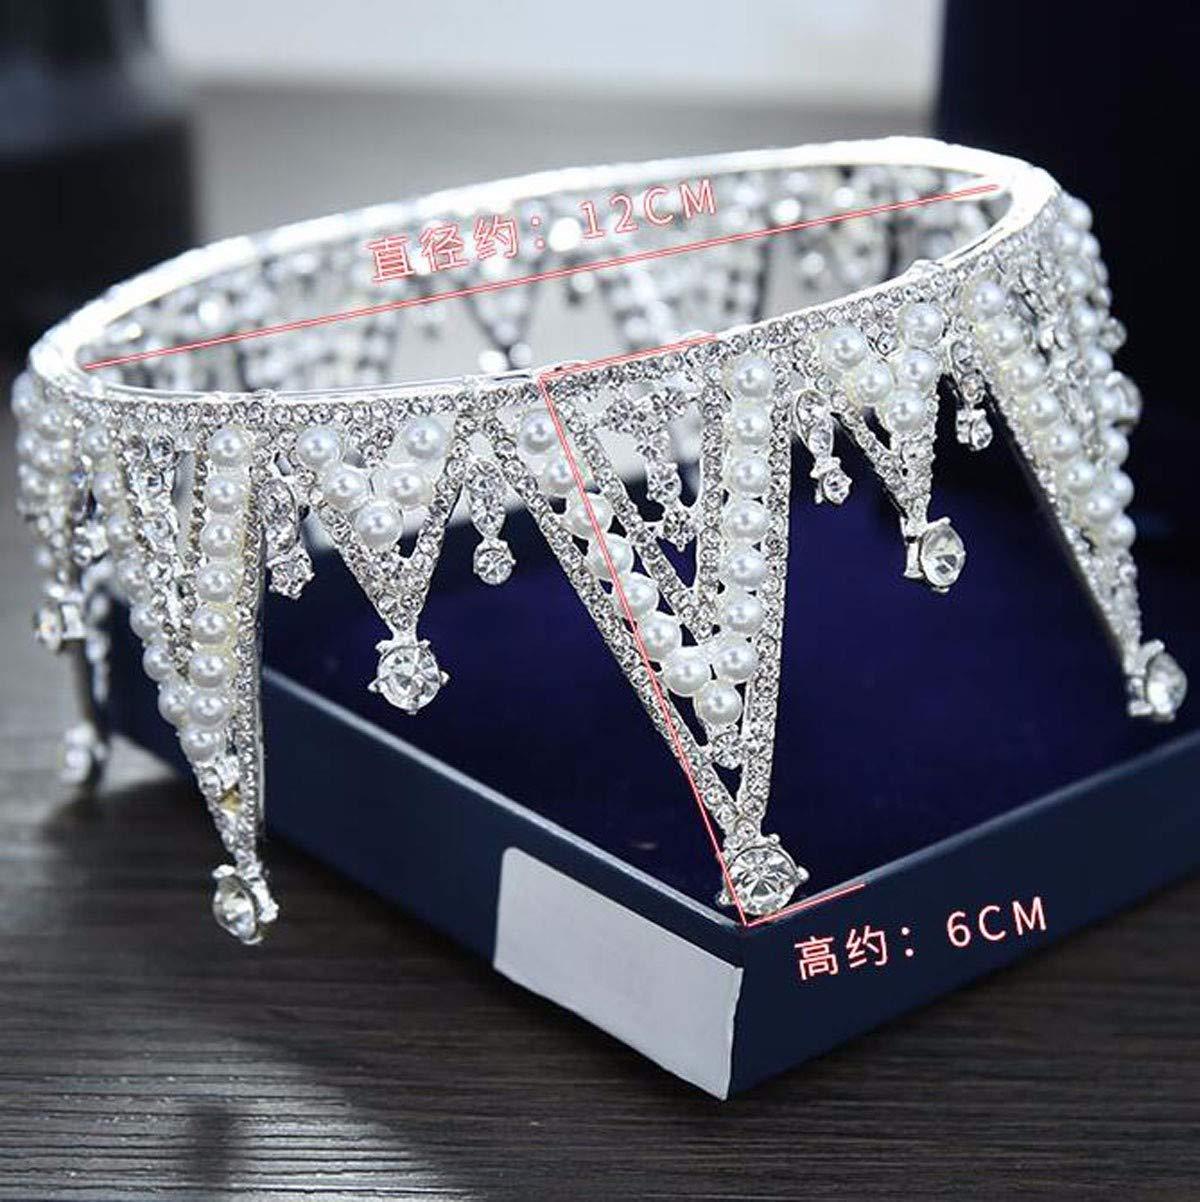 Wedding Crown, Beautiful headdress/Bridal Baroque Crystal Queen Crown Wedding Headwear Photo Studio Wedding Dress Pearl Jewelry by Junson (Image #2)